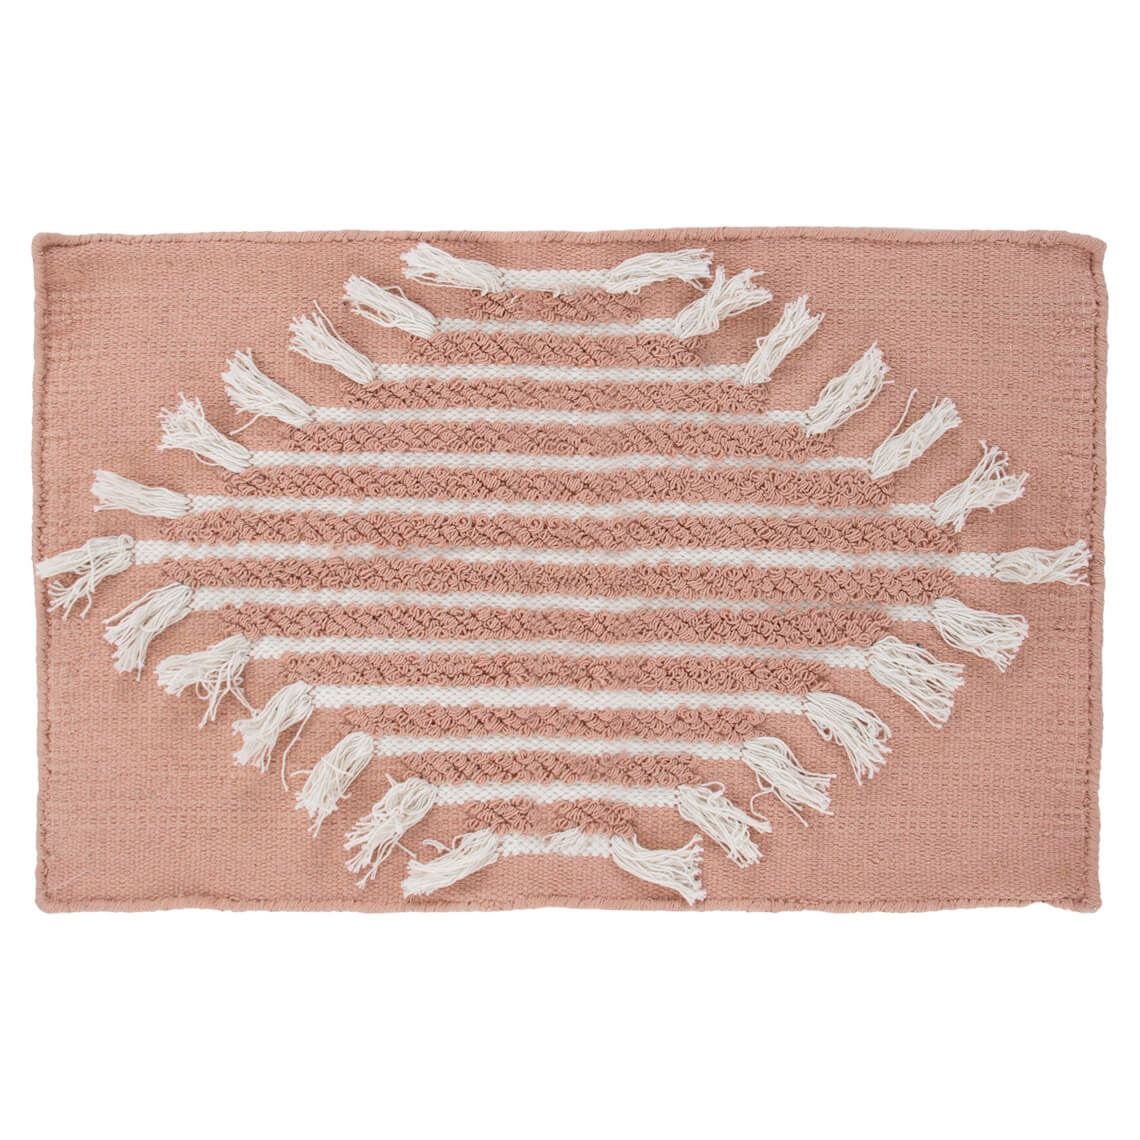 Frendi Bath Mat Size W 50cm x D 80cm x H 1cm in Pink Freedom